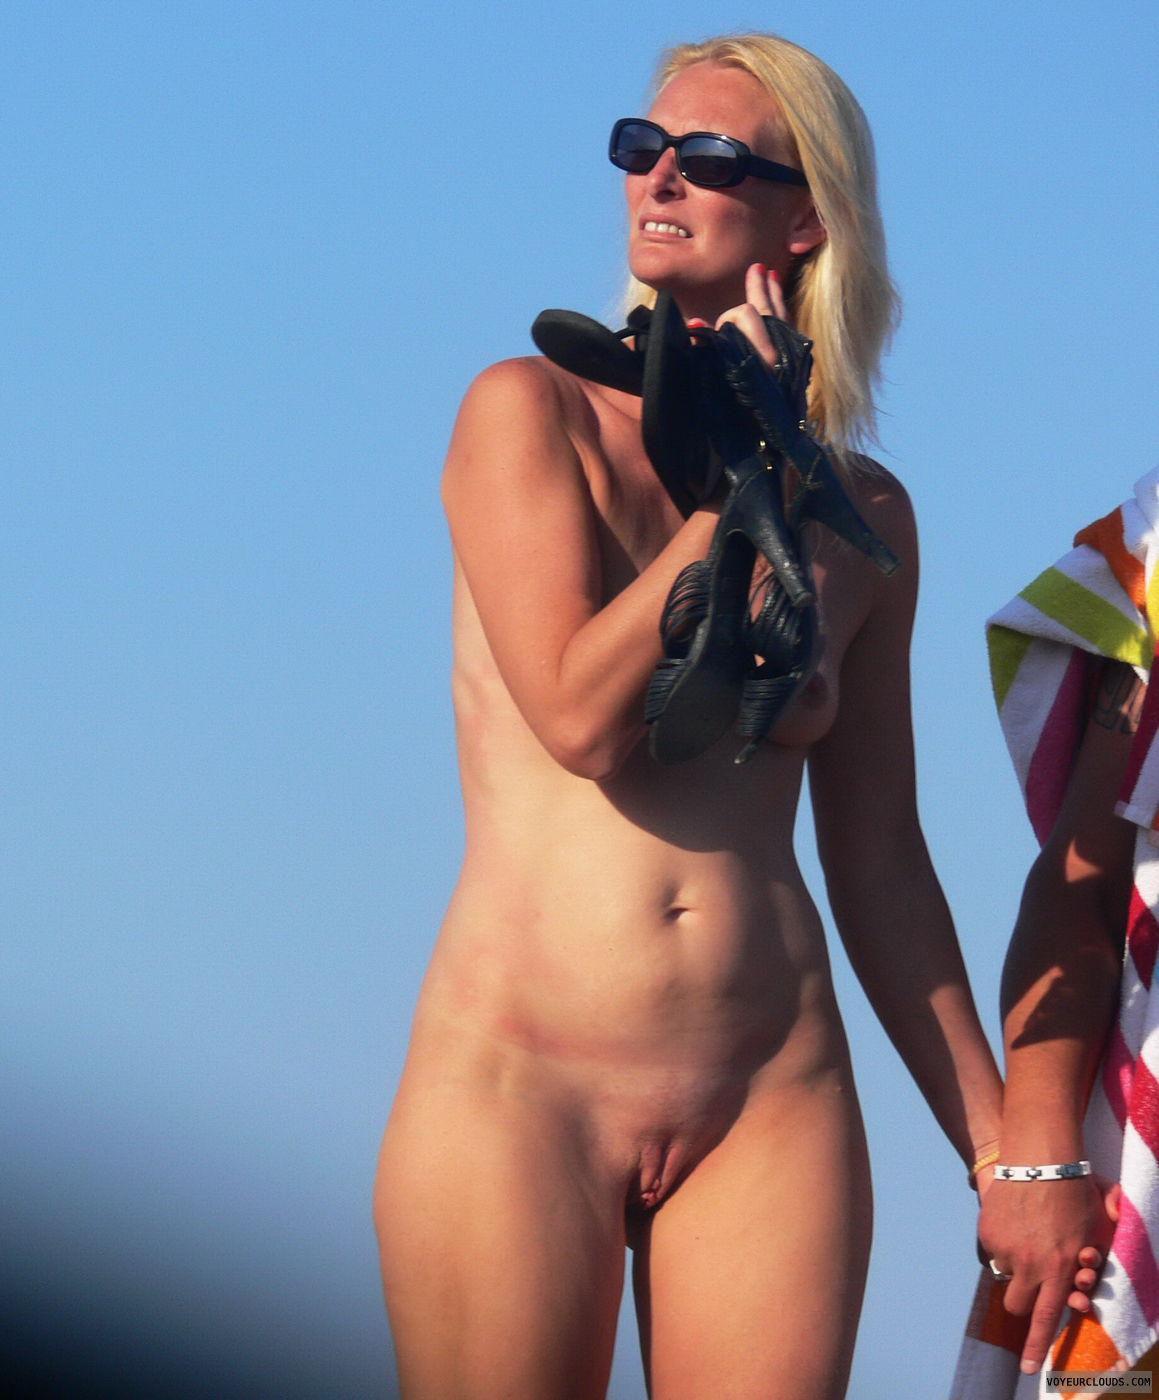 Walking on nude beach